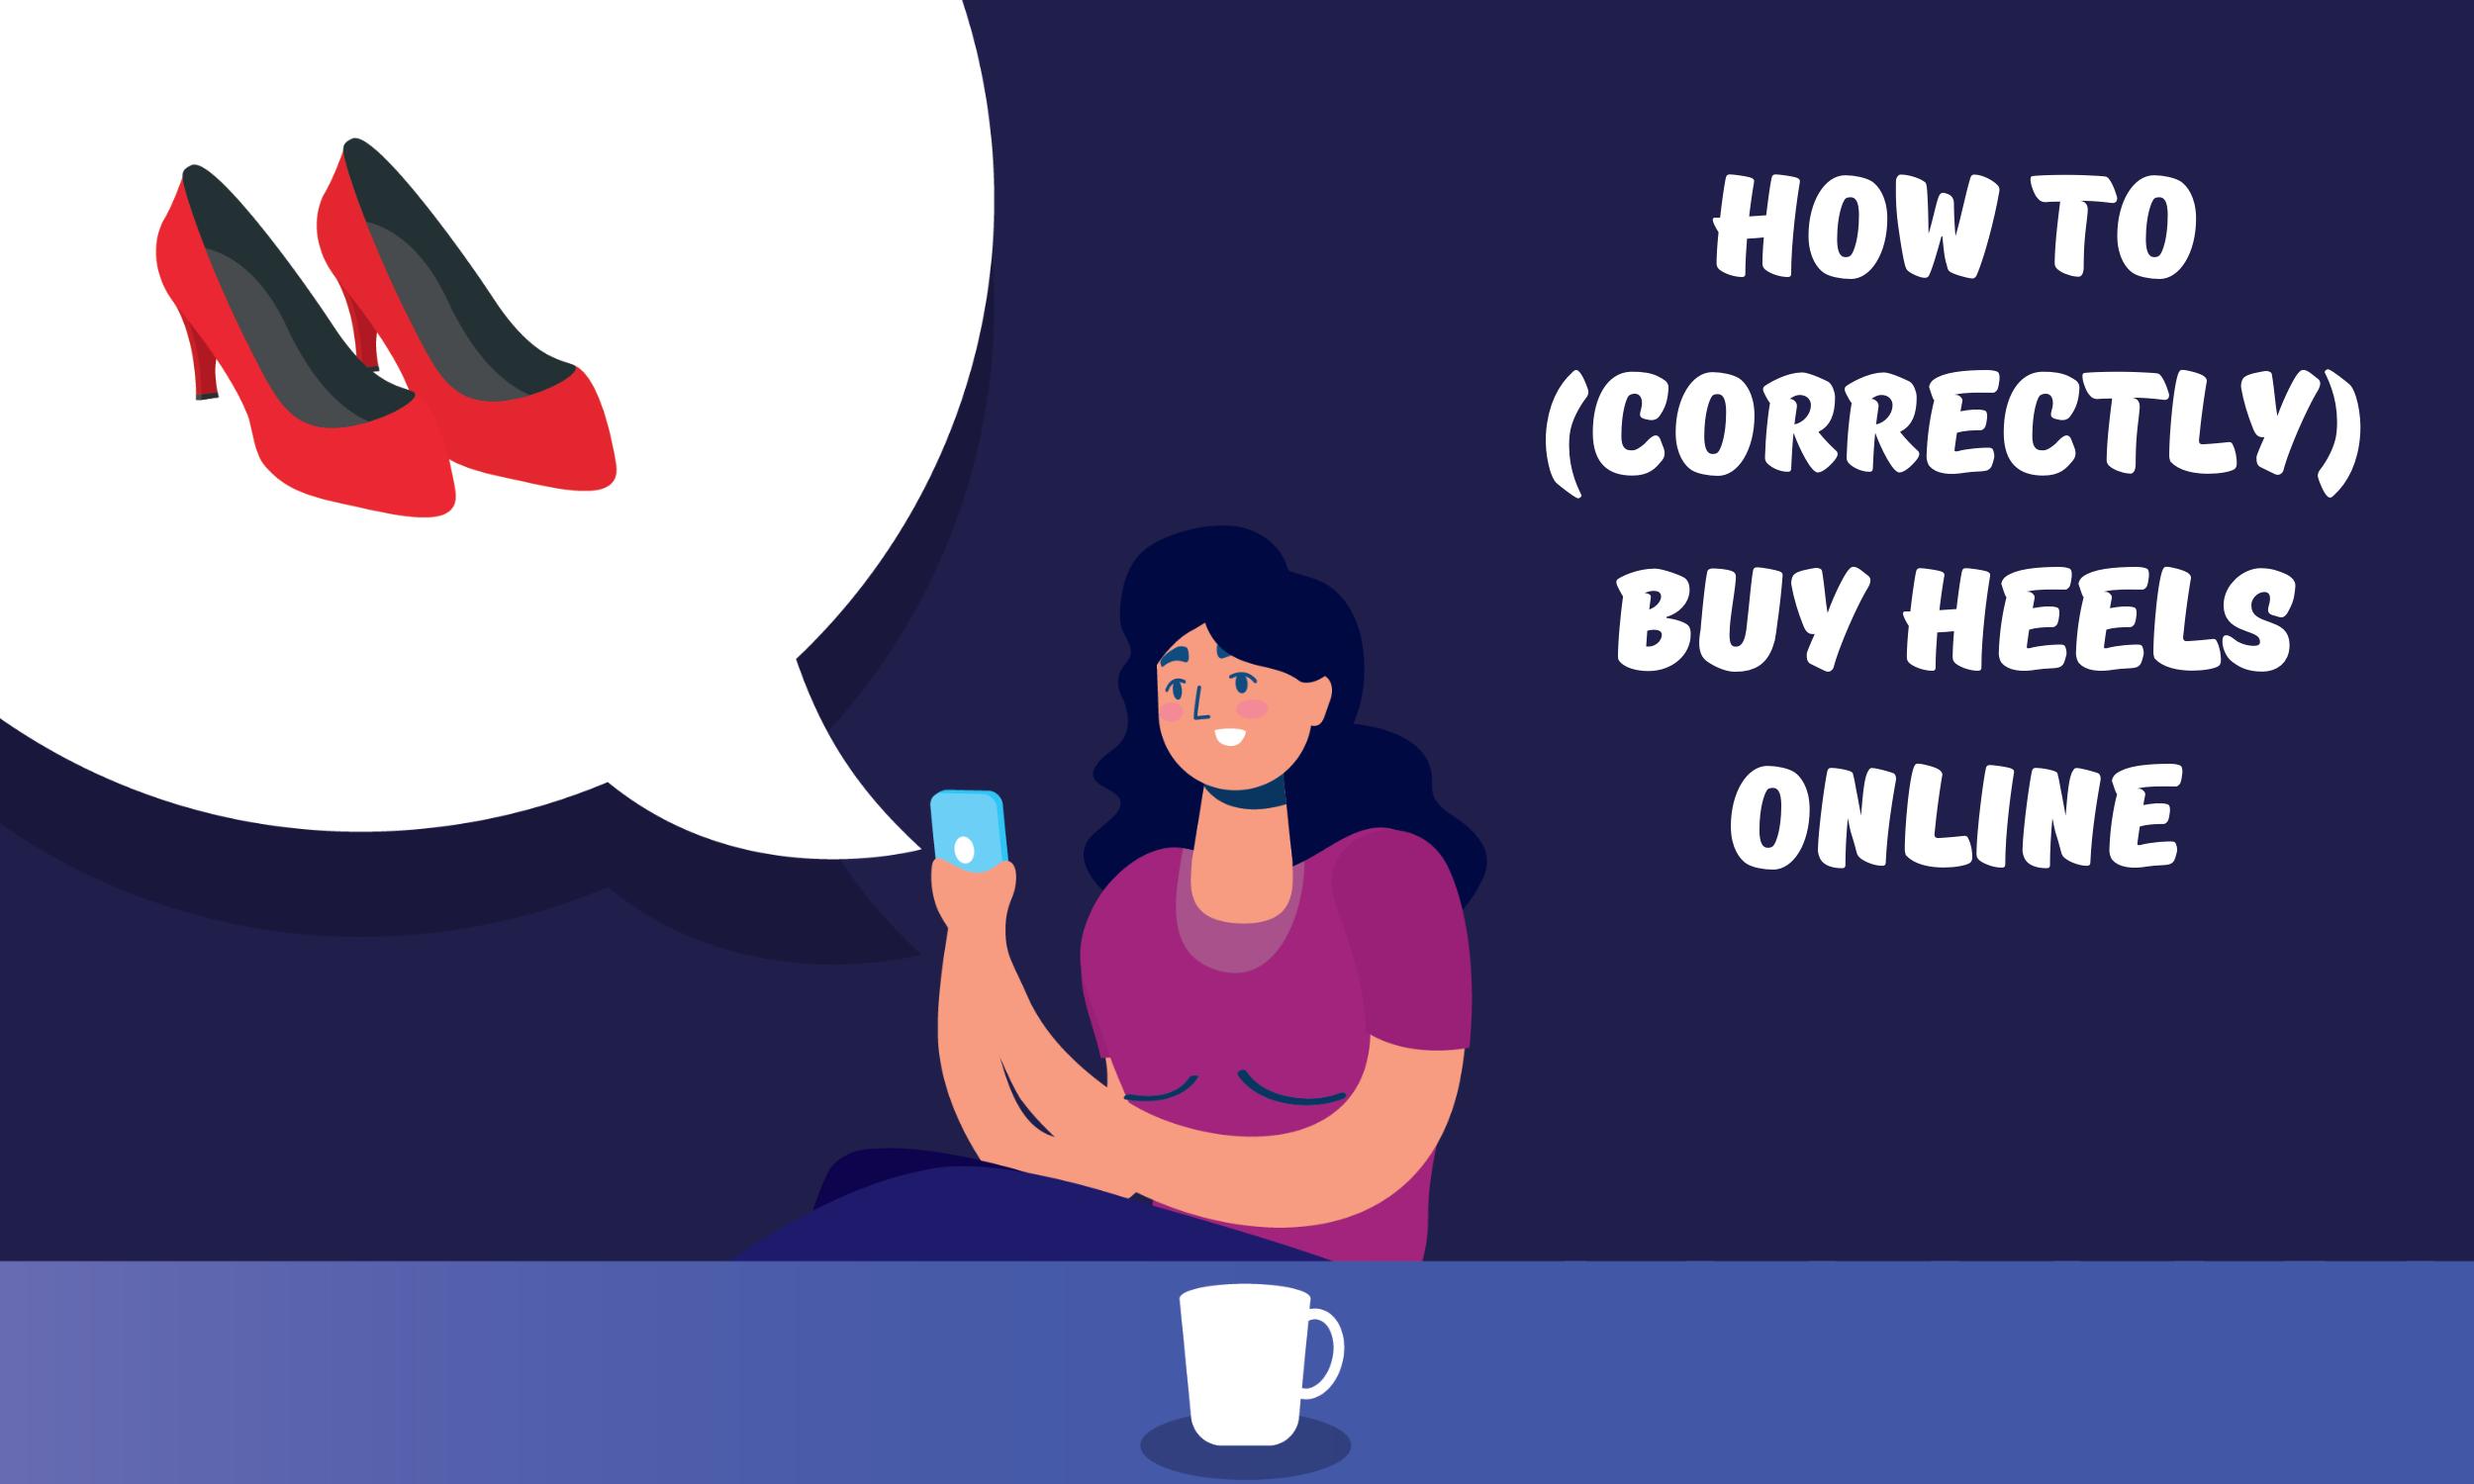 How-to-correctly-buy-heels-online